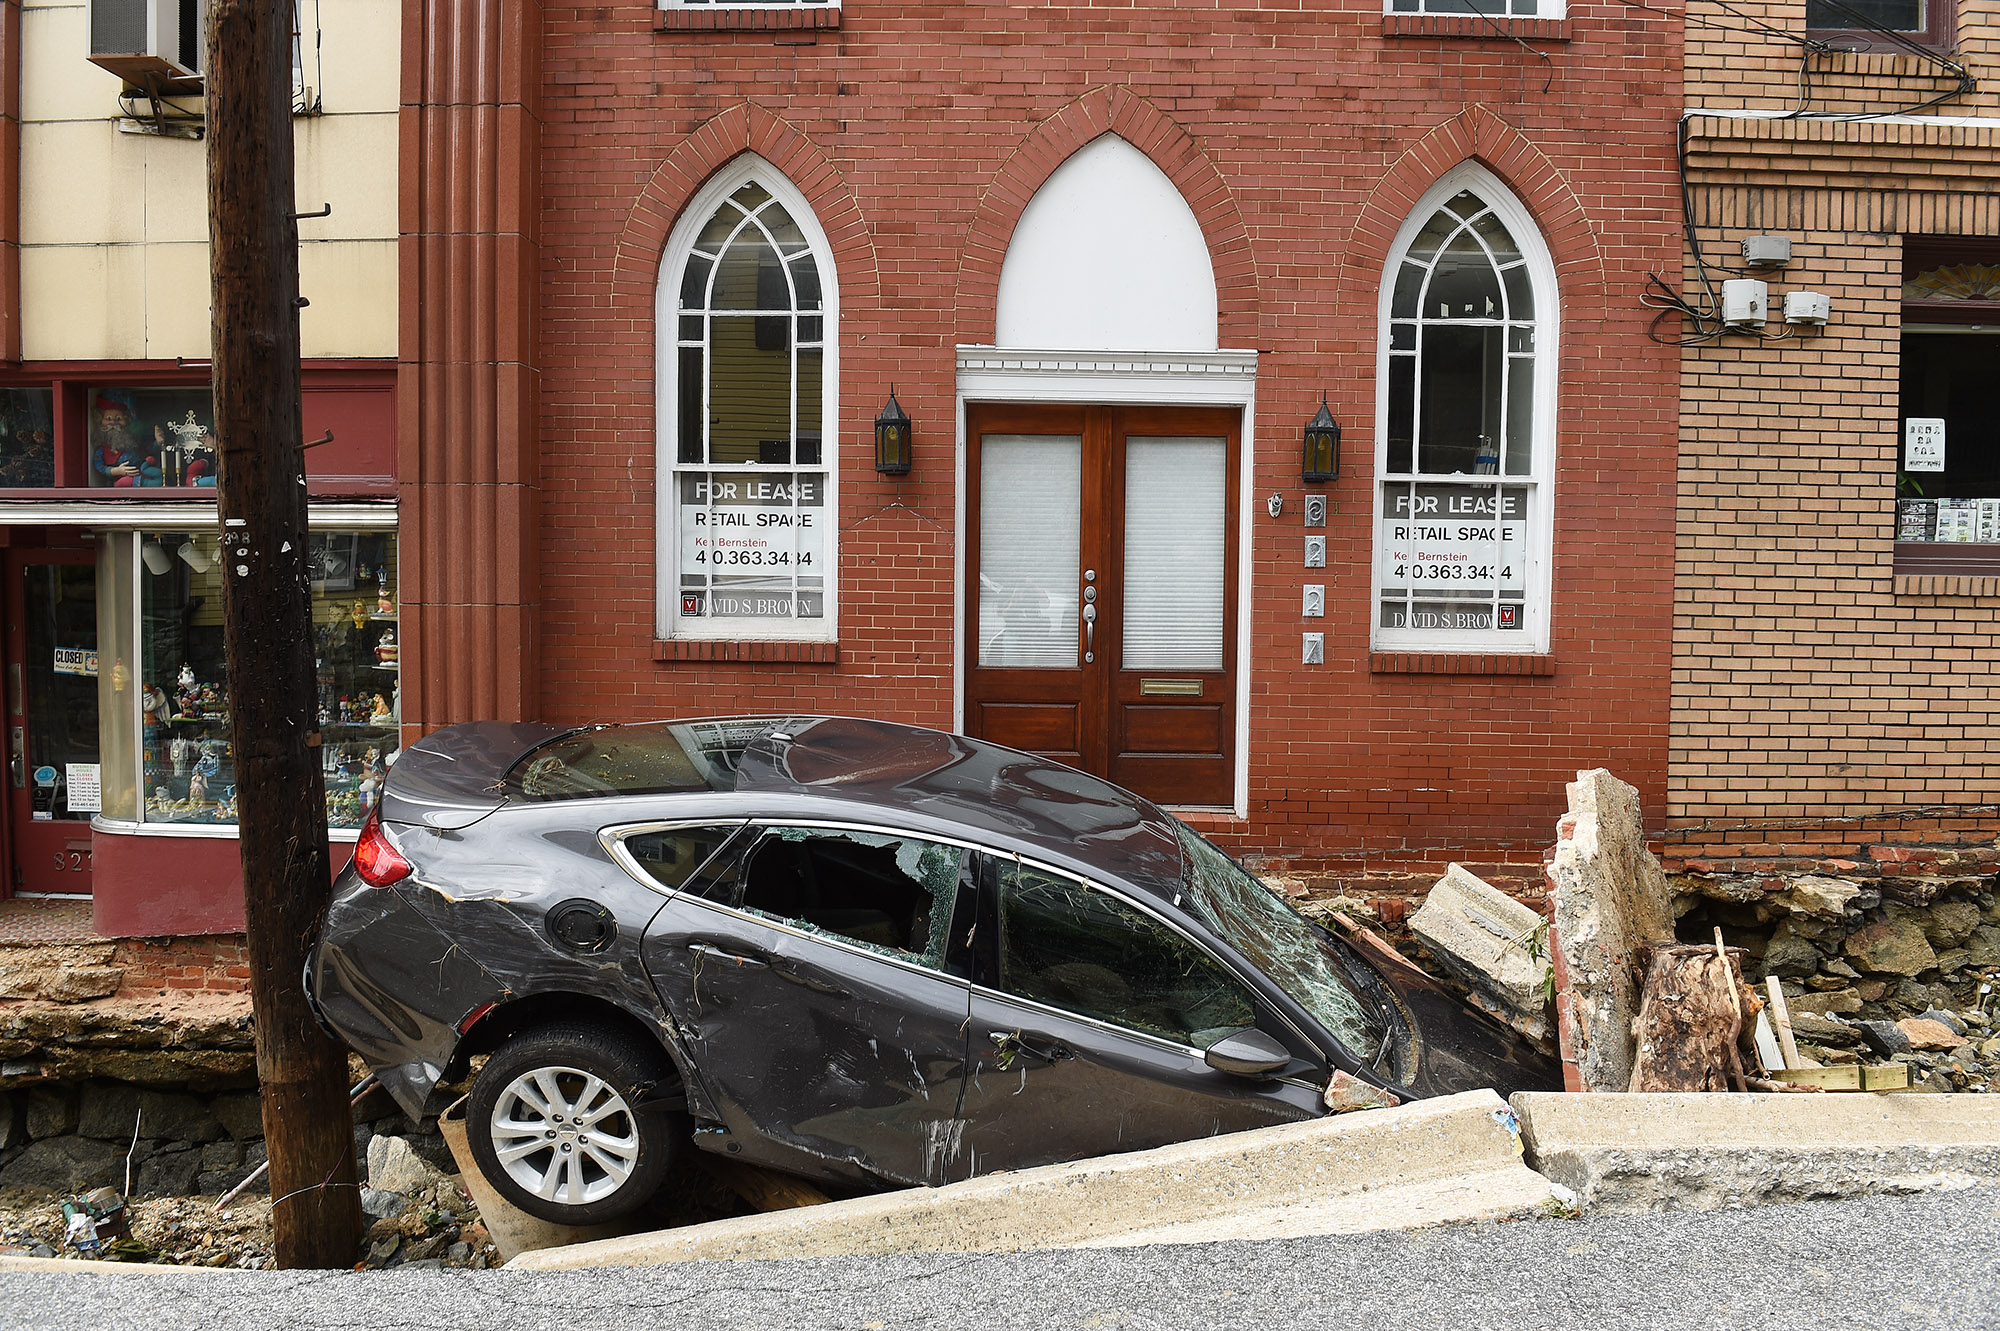 ELLICOTT CITY, MD - JULY 31: Destruction caused by a flash flo